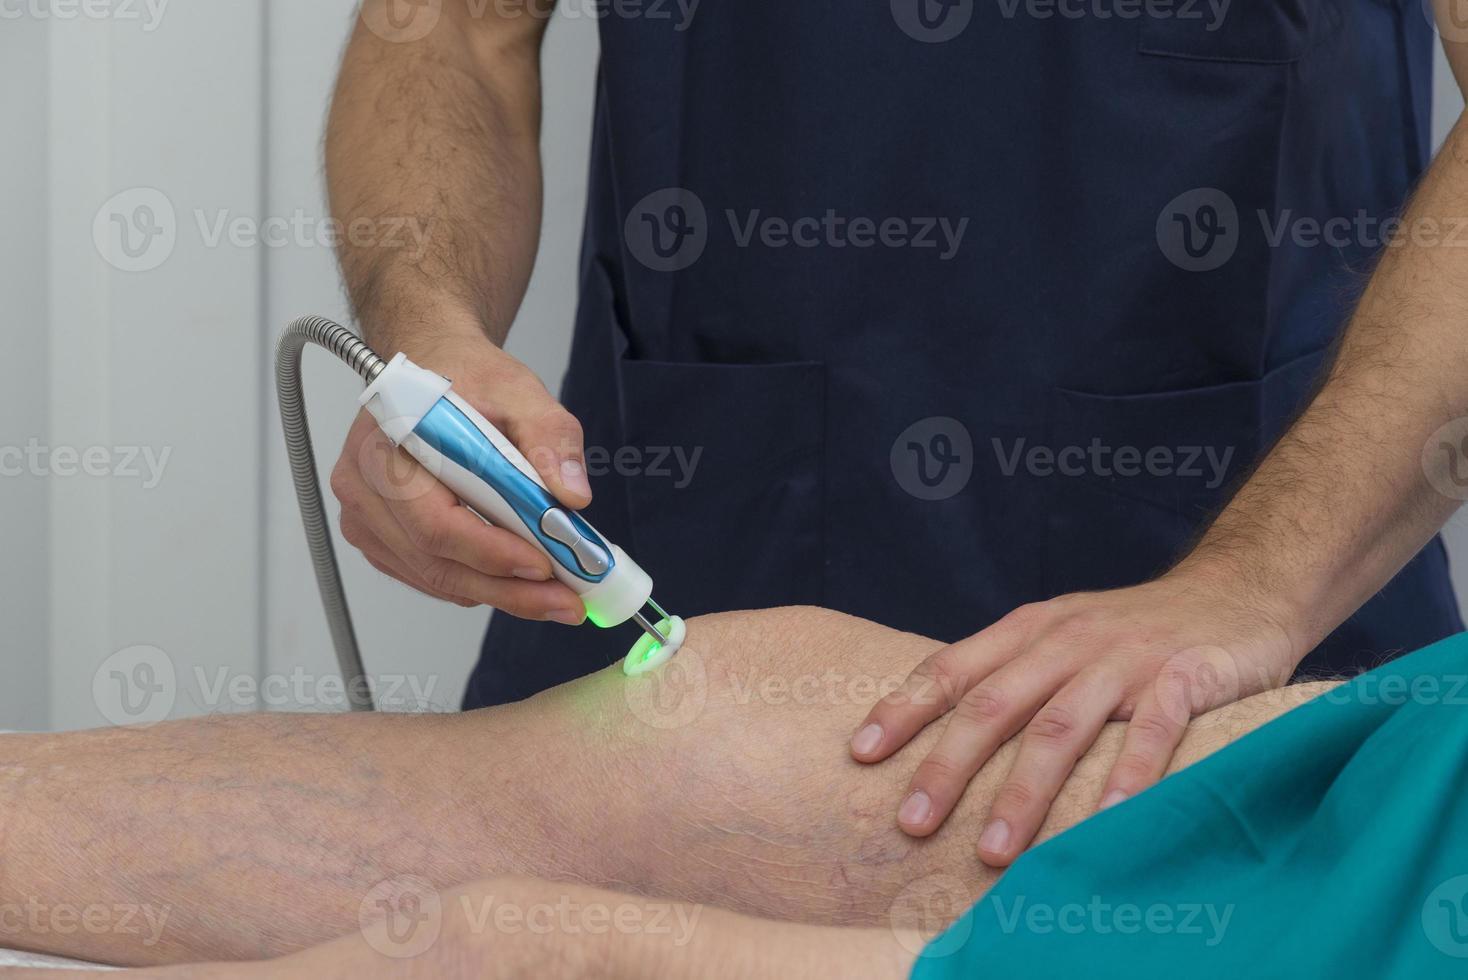 fysioterapeut hjälper patientens knä vid rehabilitering foto